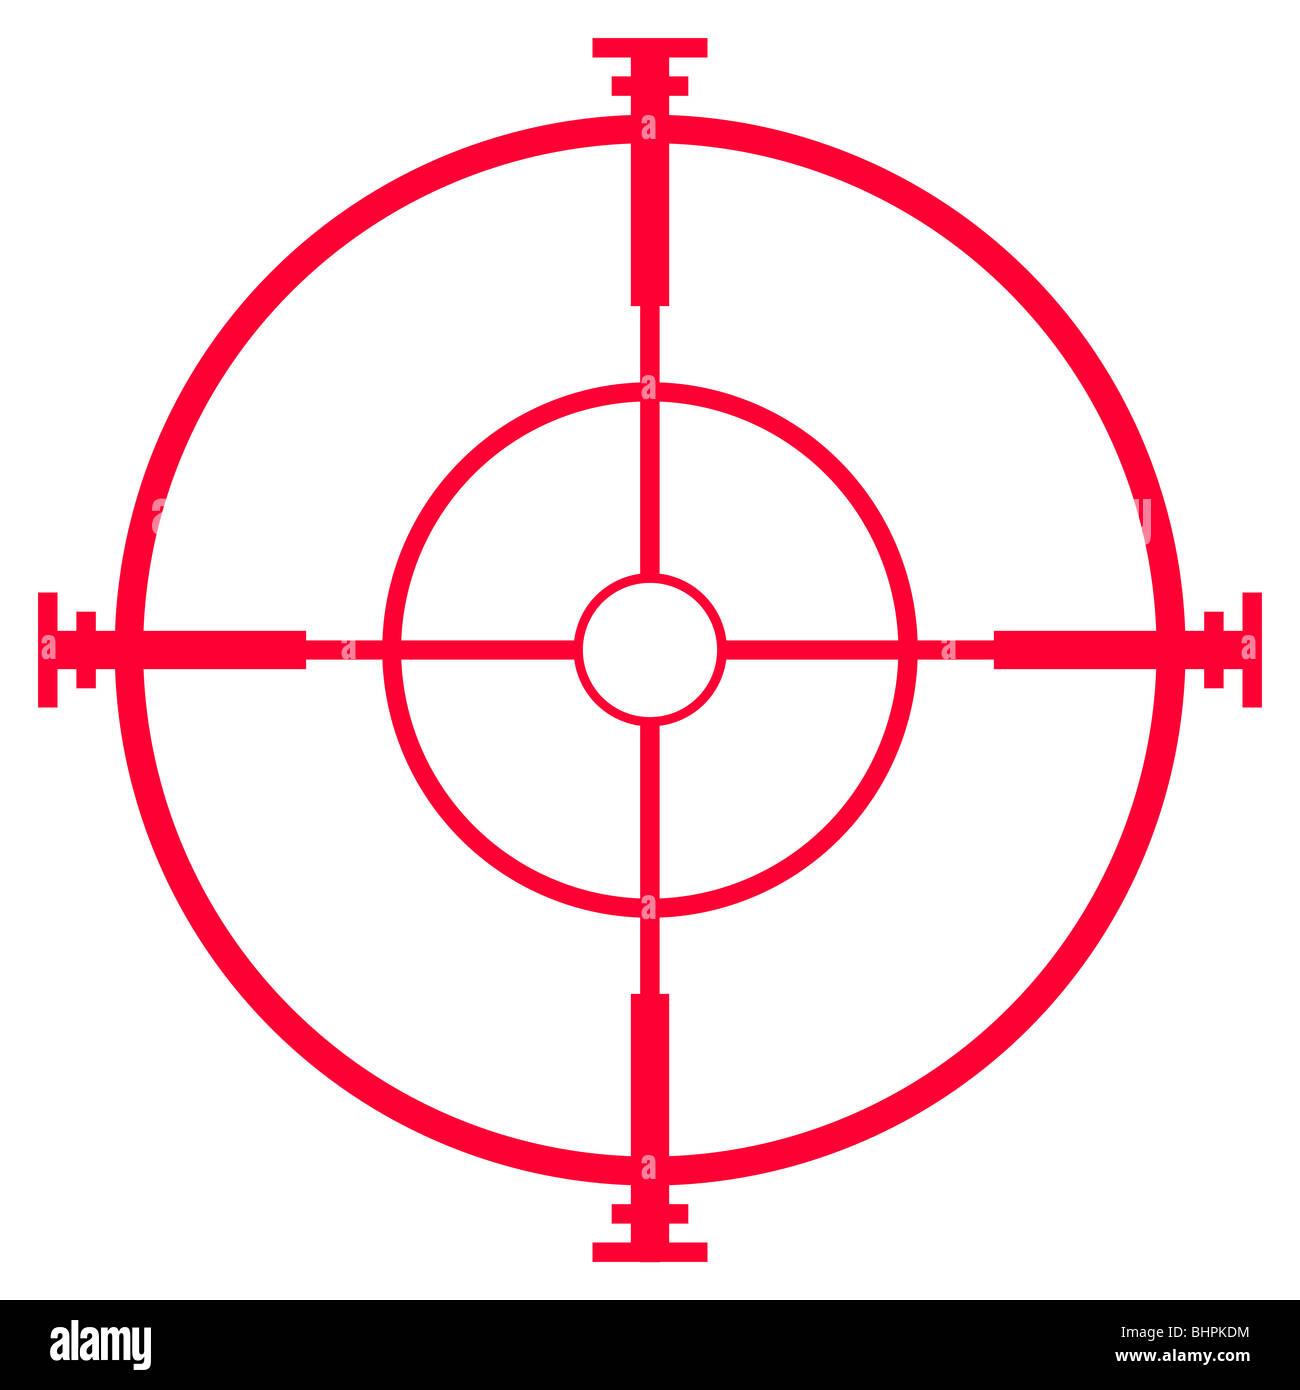 Illustration of sniper rifle sight or scope, isolated on white background. - Stock Image